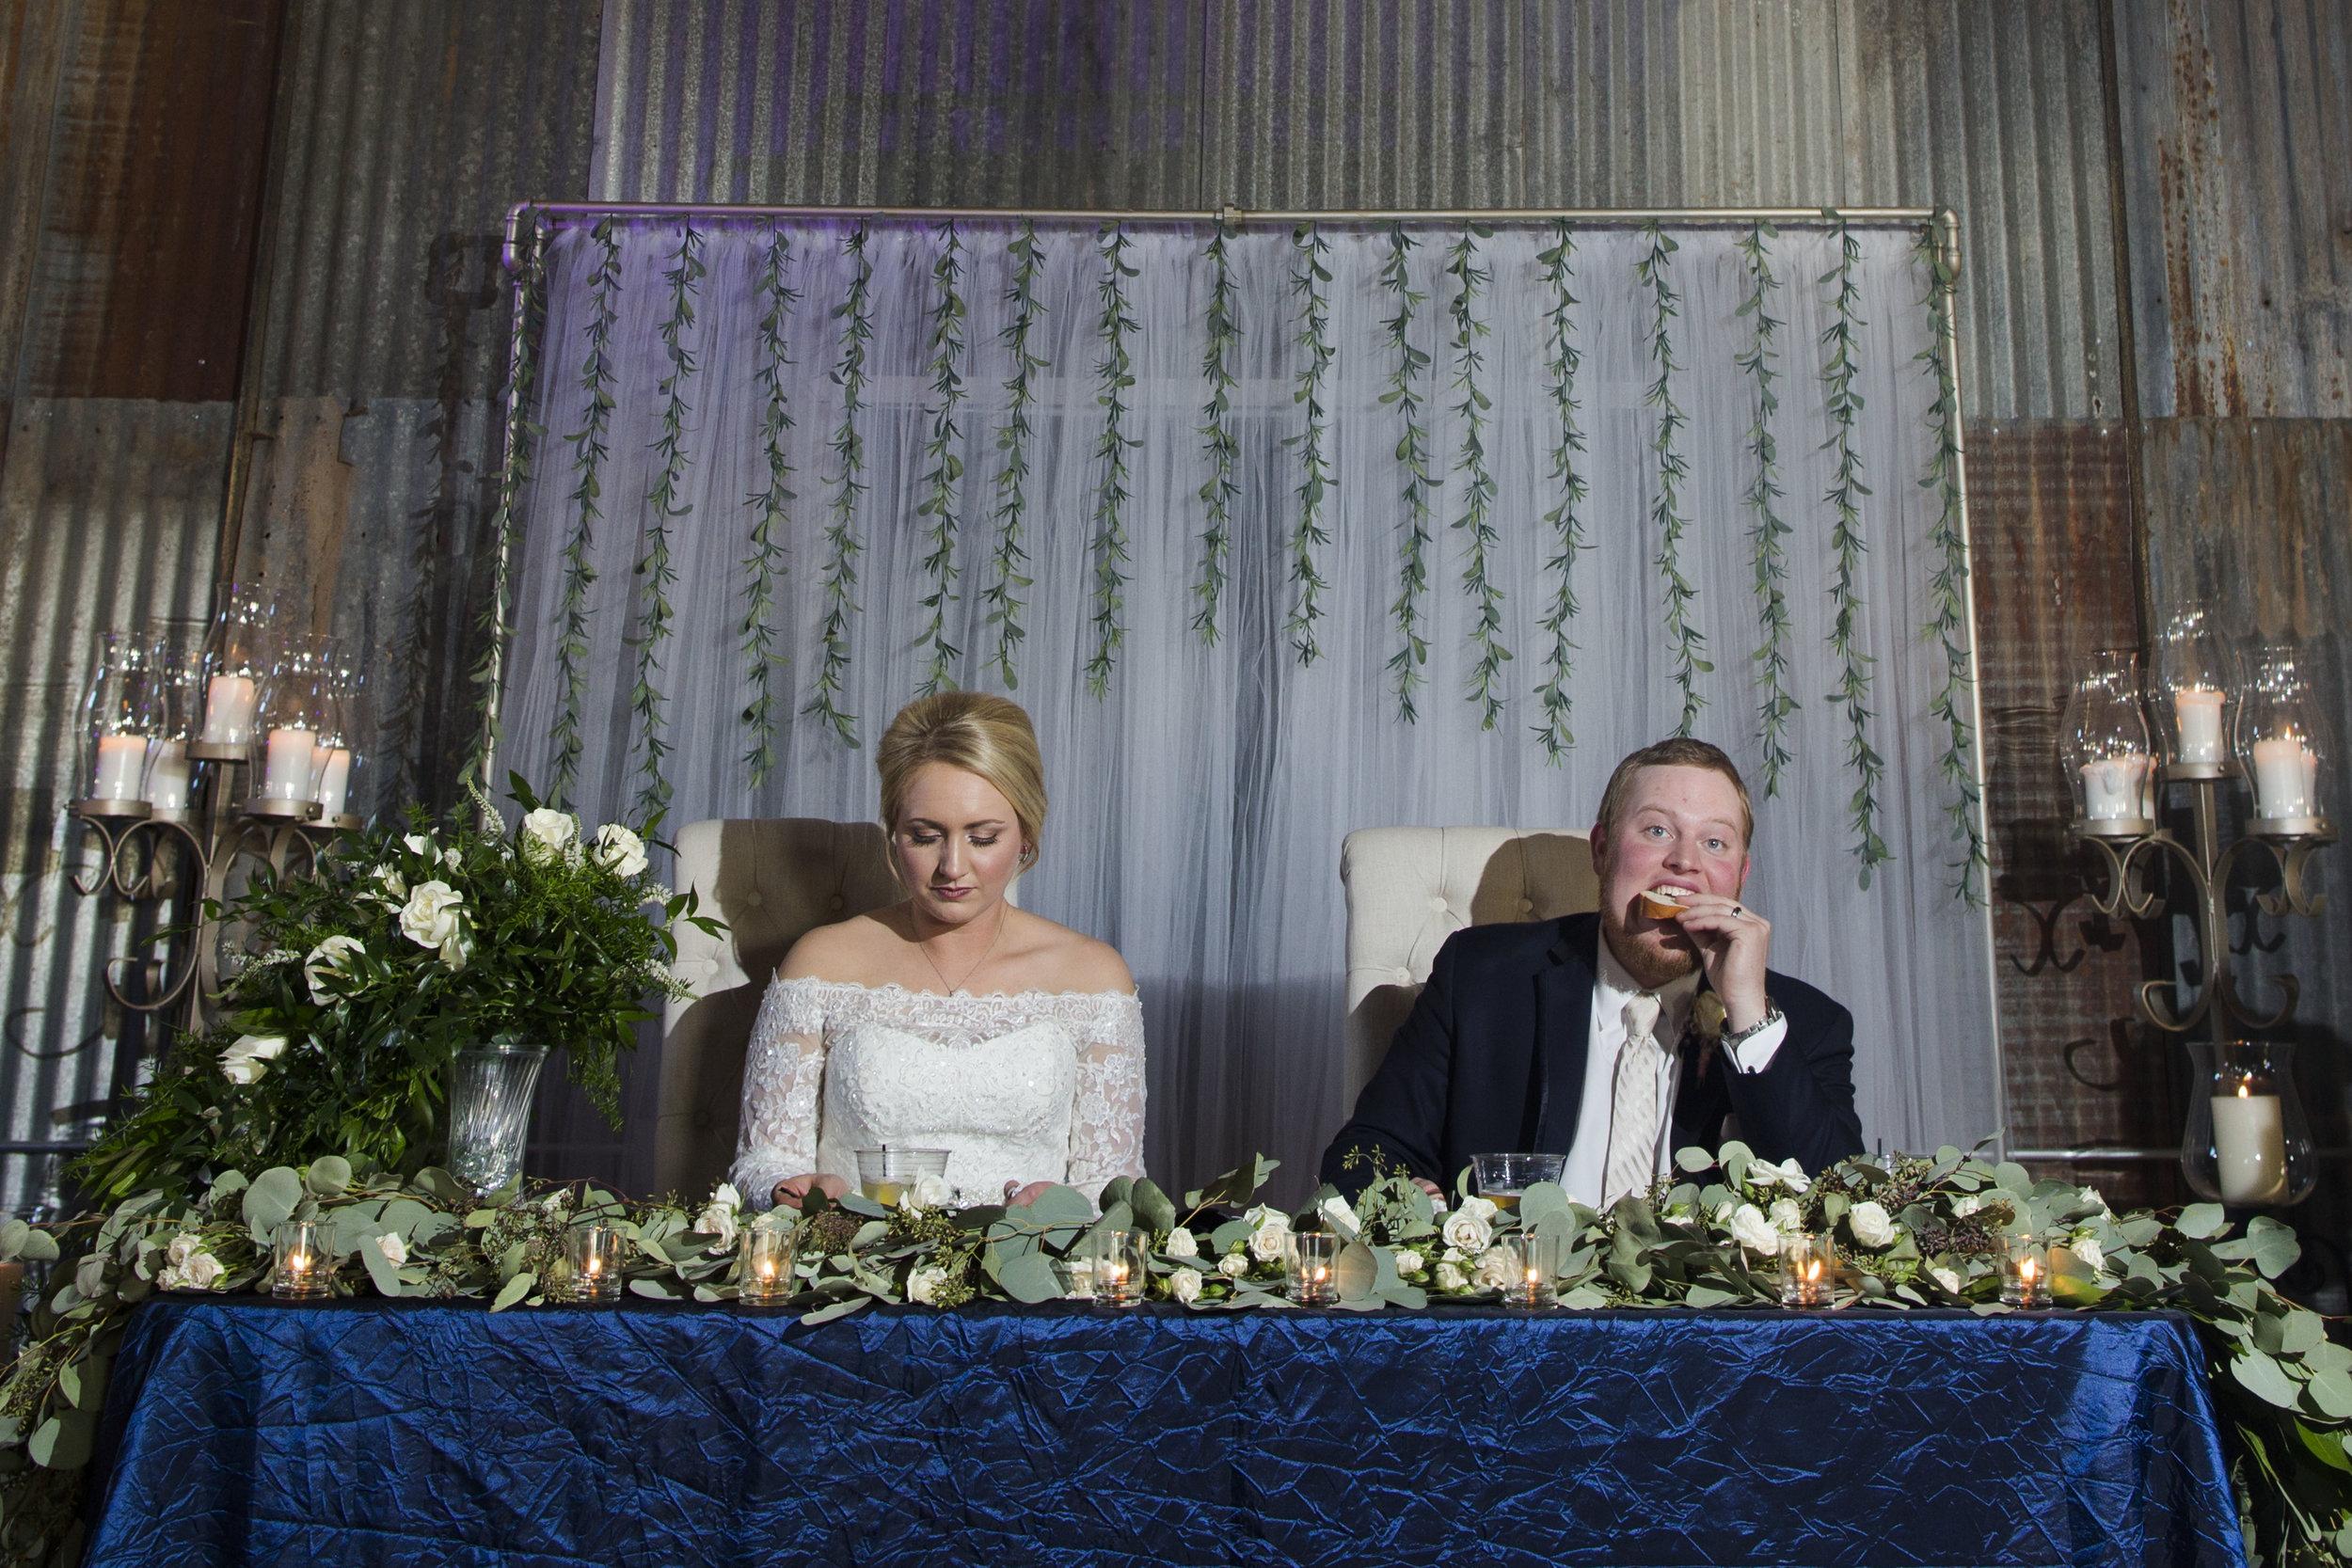 lubbock_wedding_photographer_Kitaou_0128.JPG